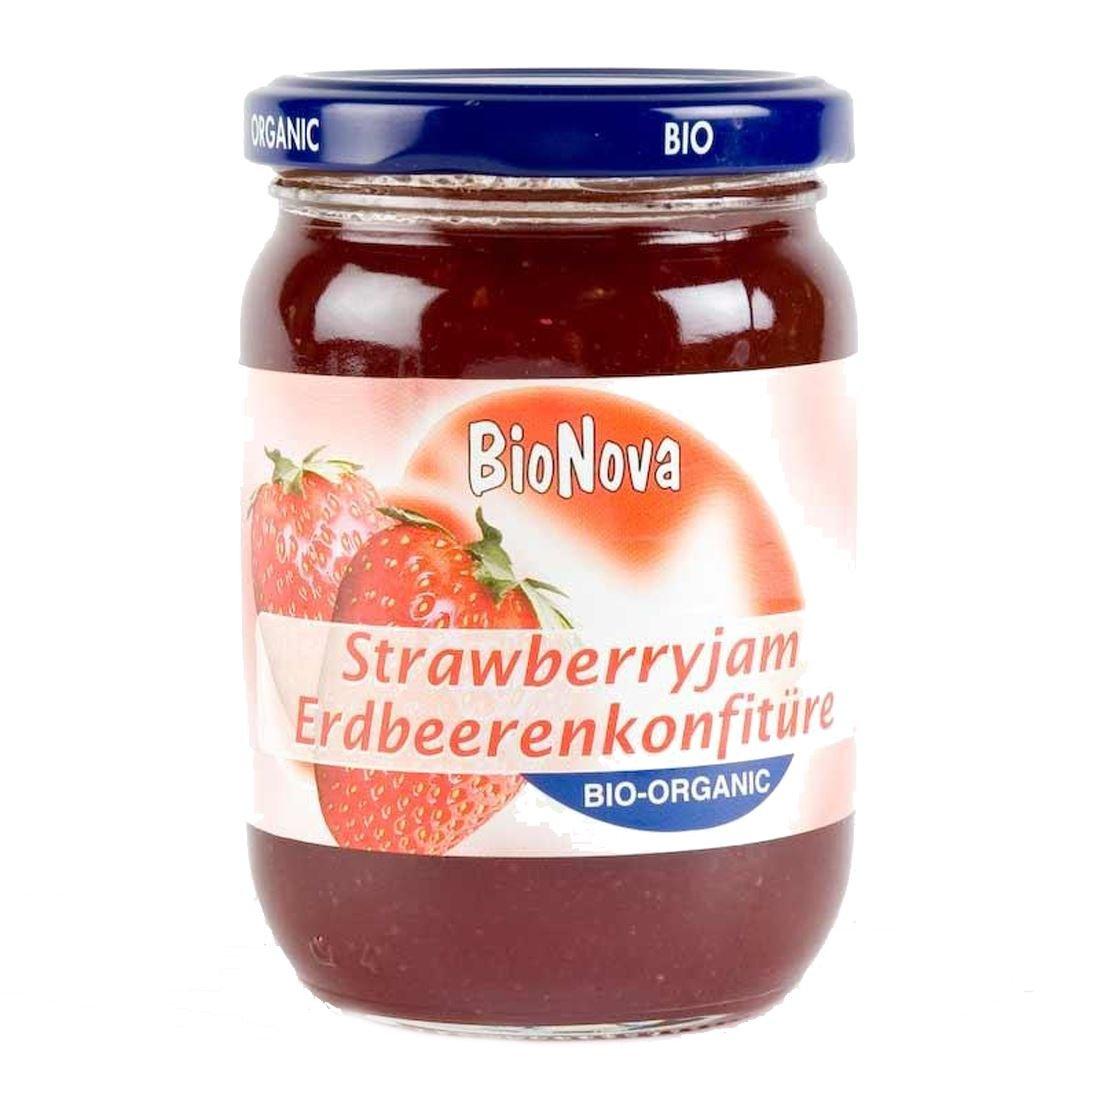 Bionova   Strawberry Jam - organic   1 x 340g